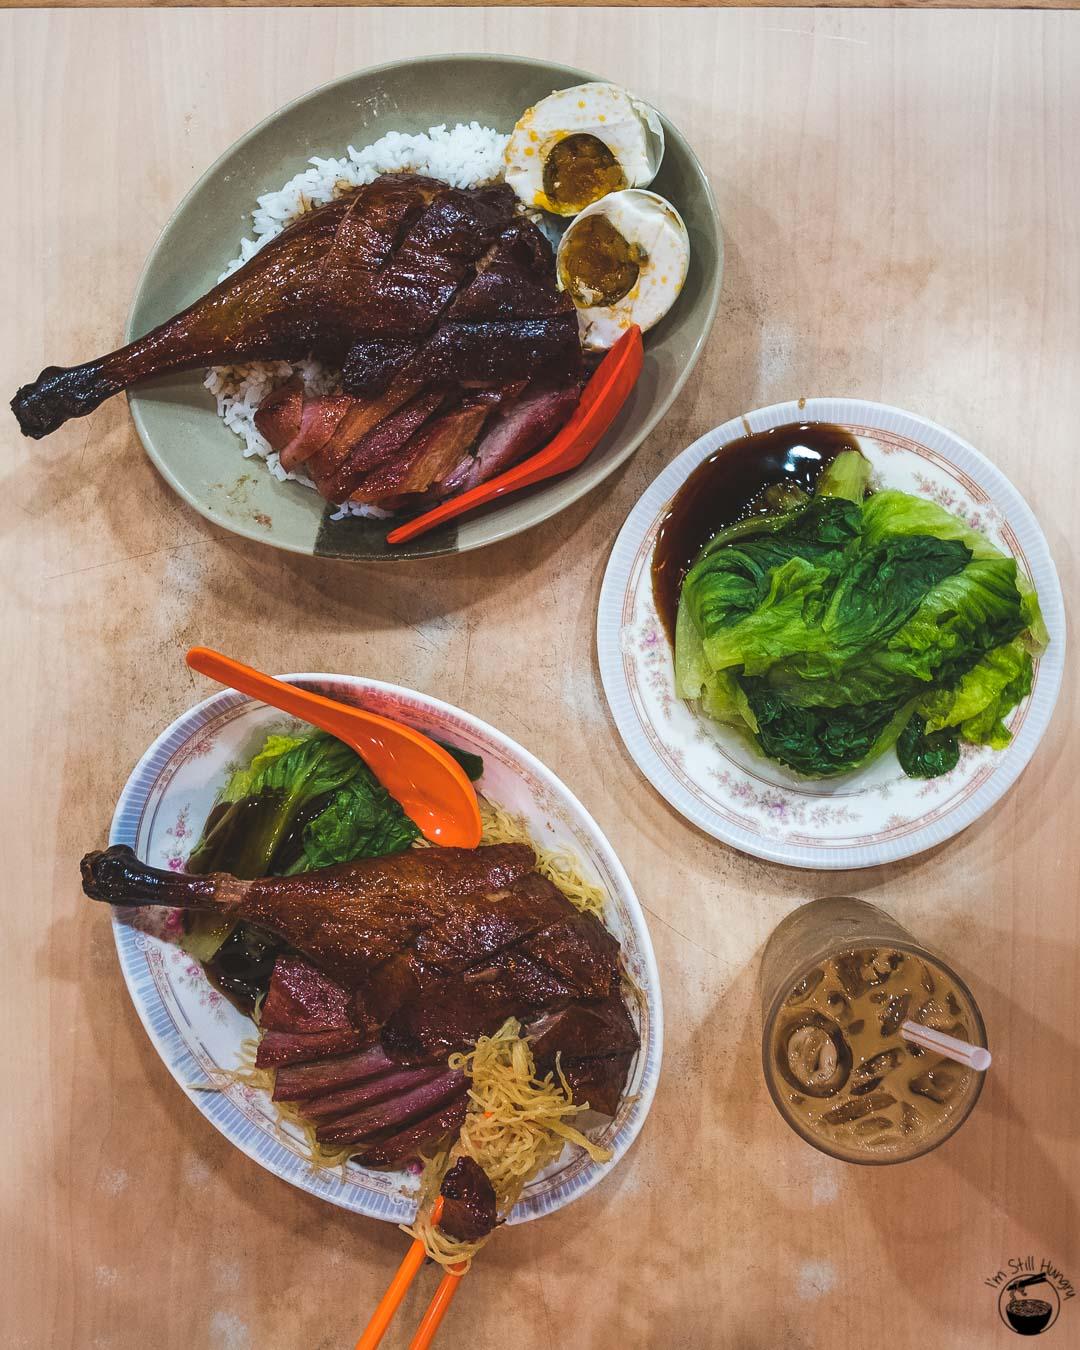 Yat Lok Roast Goose Hong Kong